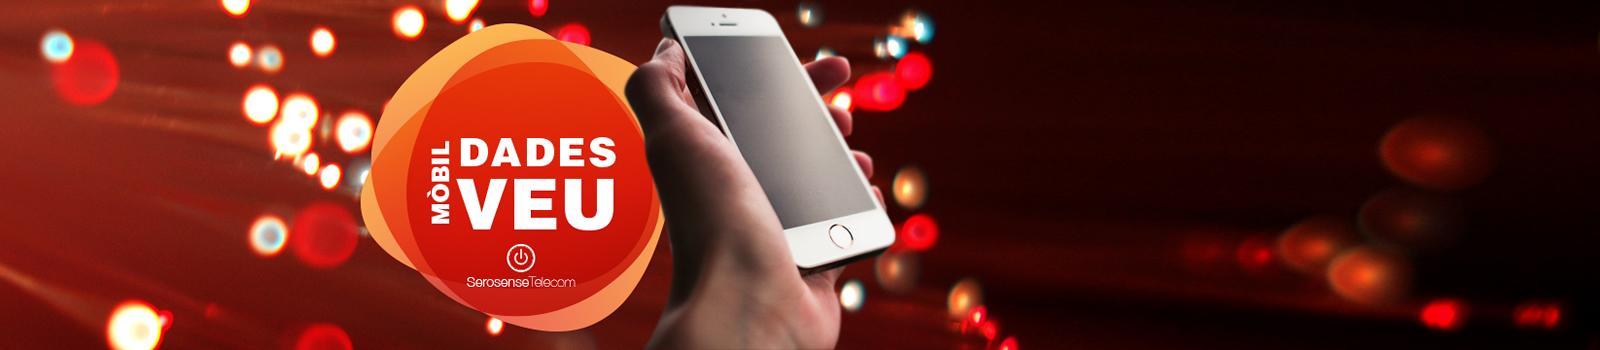 mobil-dades-veu